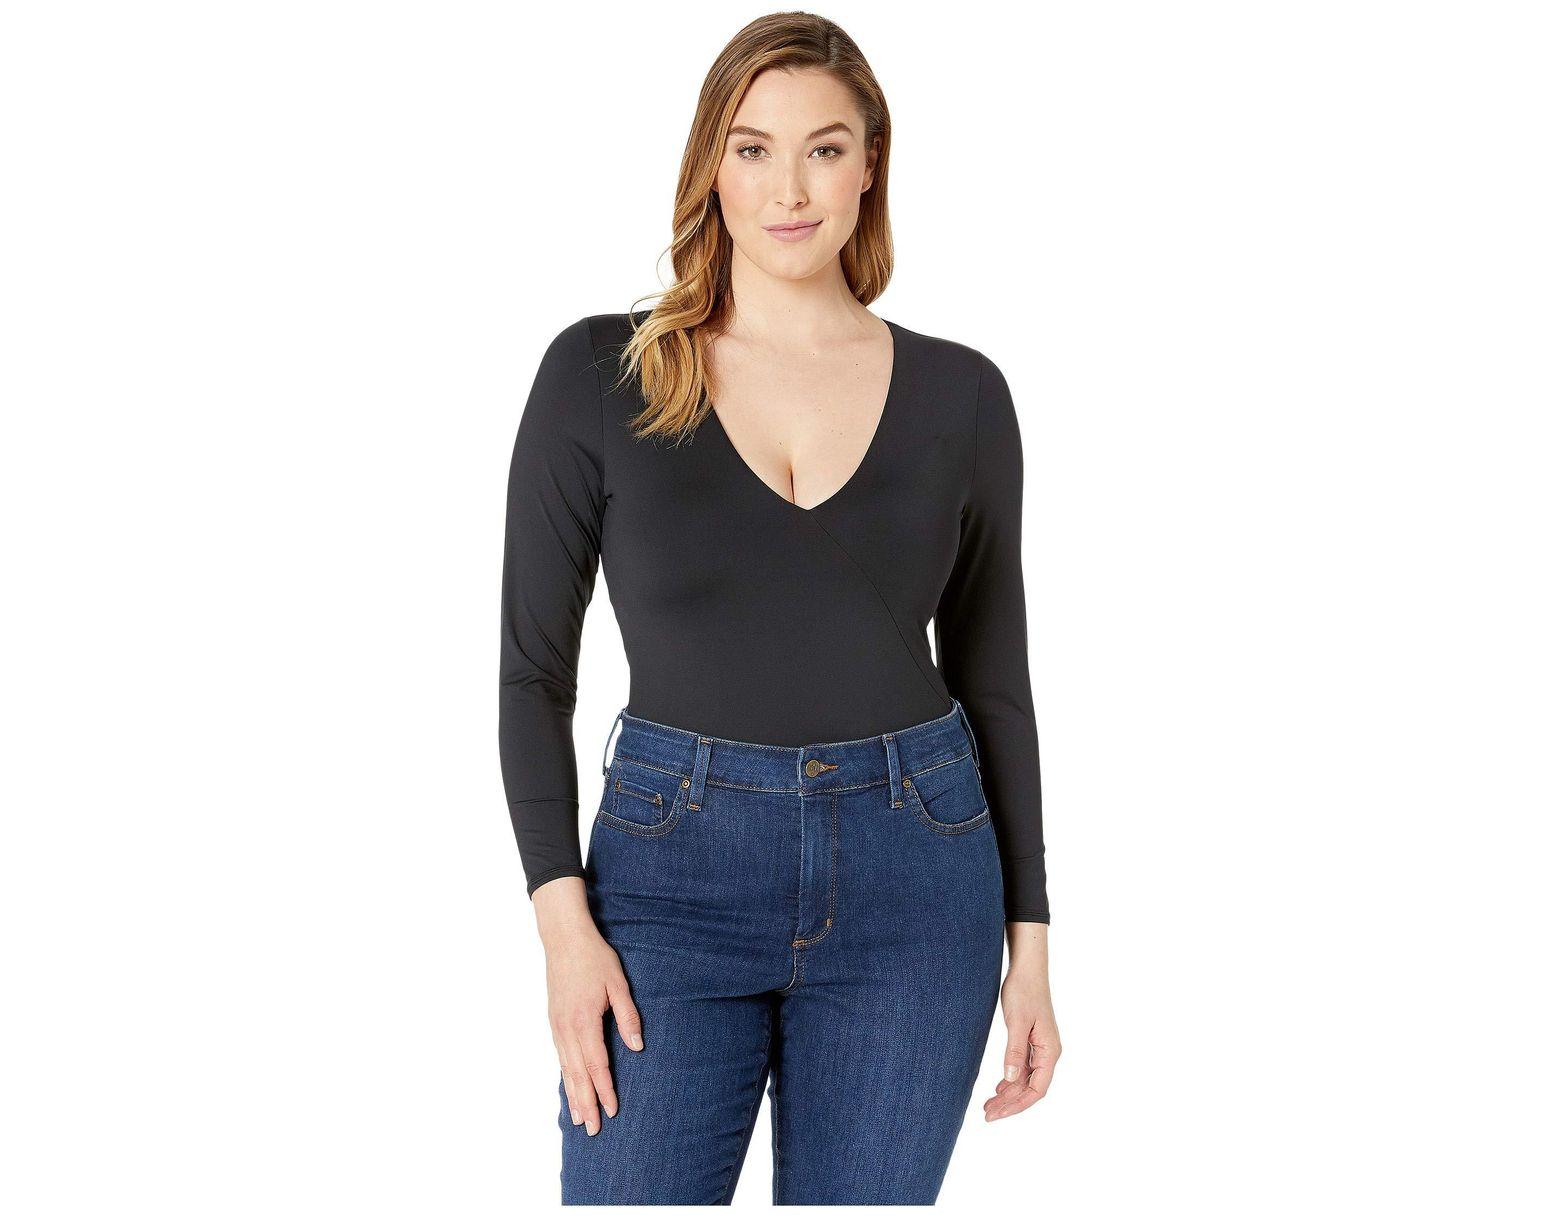 406bbf999 Volcom Plus Size Simply Seamless Bodysuit (black) Women s Swimsuits One  Piece in Black - Lyst